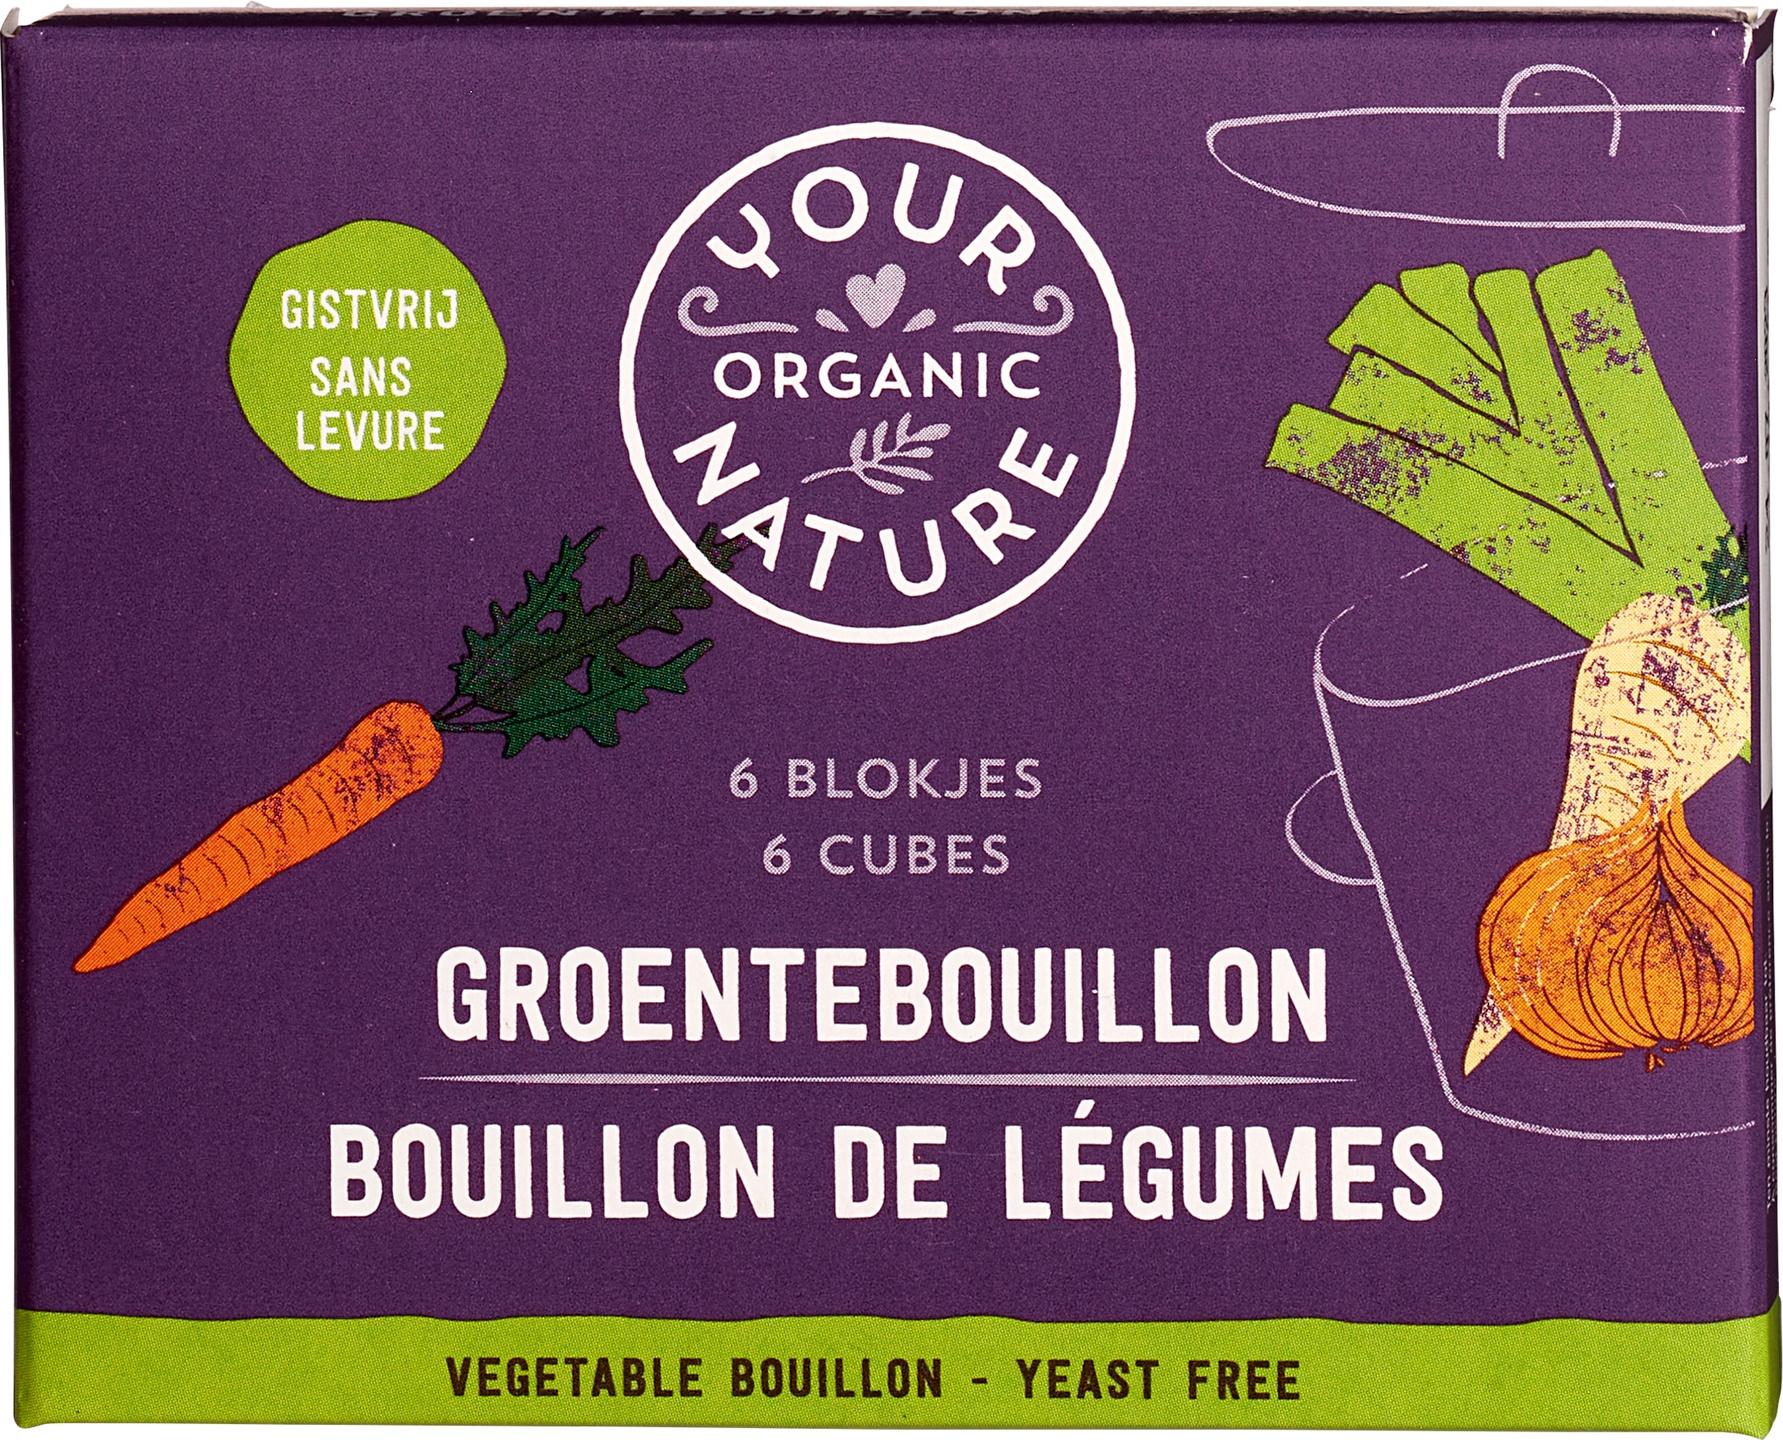 Biologische Your Organic Nature Groentebouillonblokjes gistvrij 66 gr